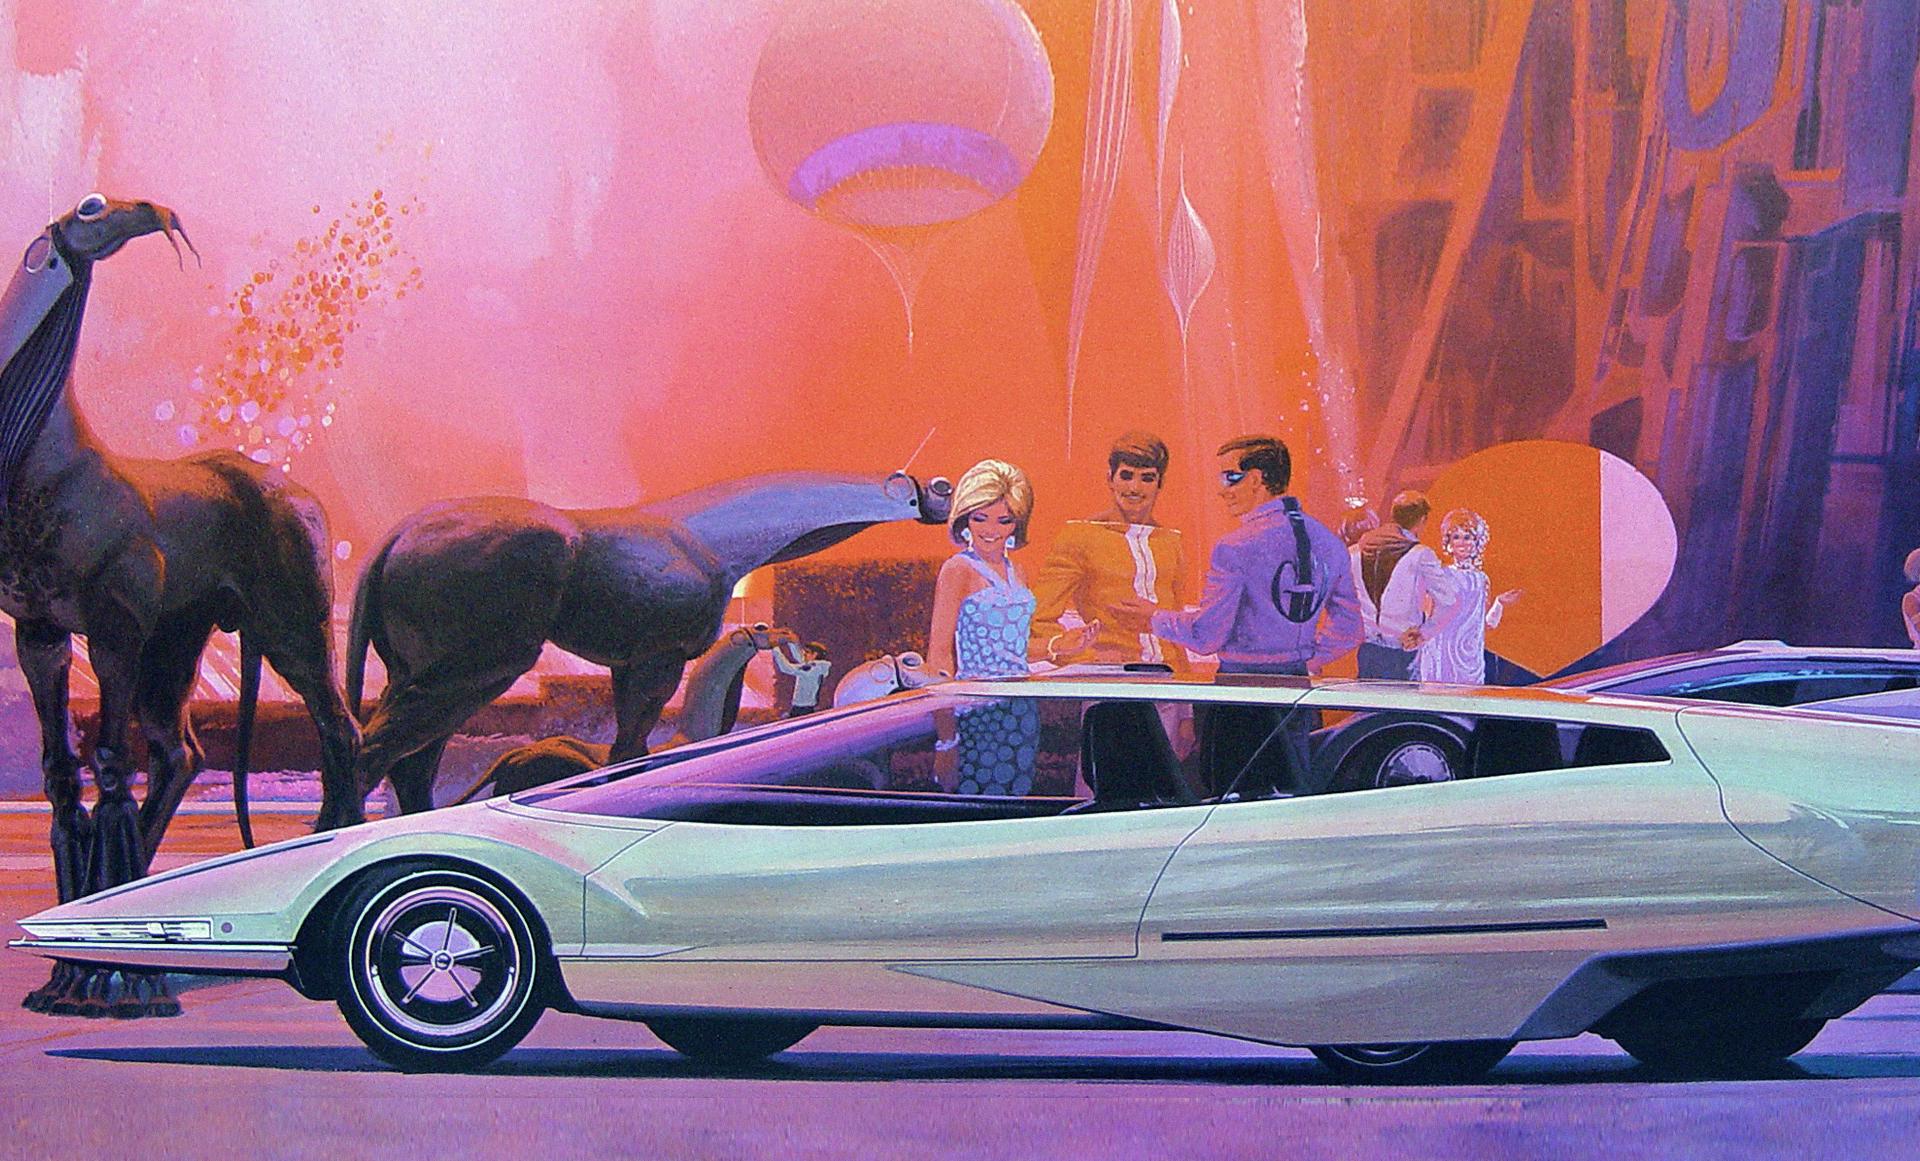 Кино, автопилот и батарейки: какими будут автомобили через 10-20 лет?. Фото 21